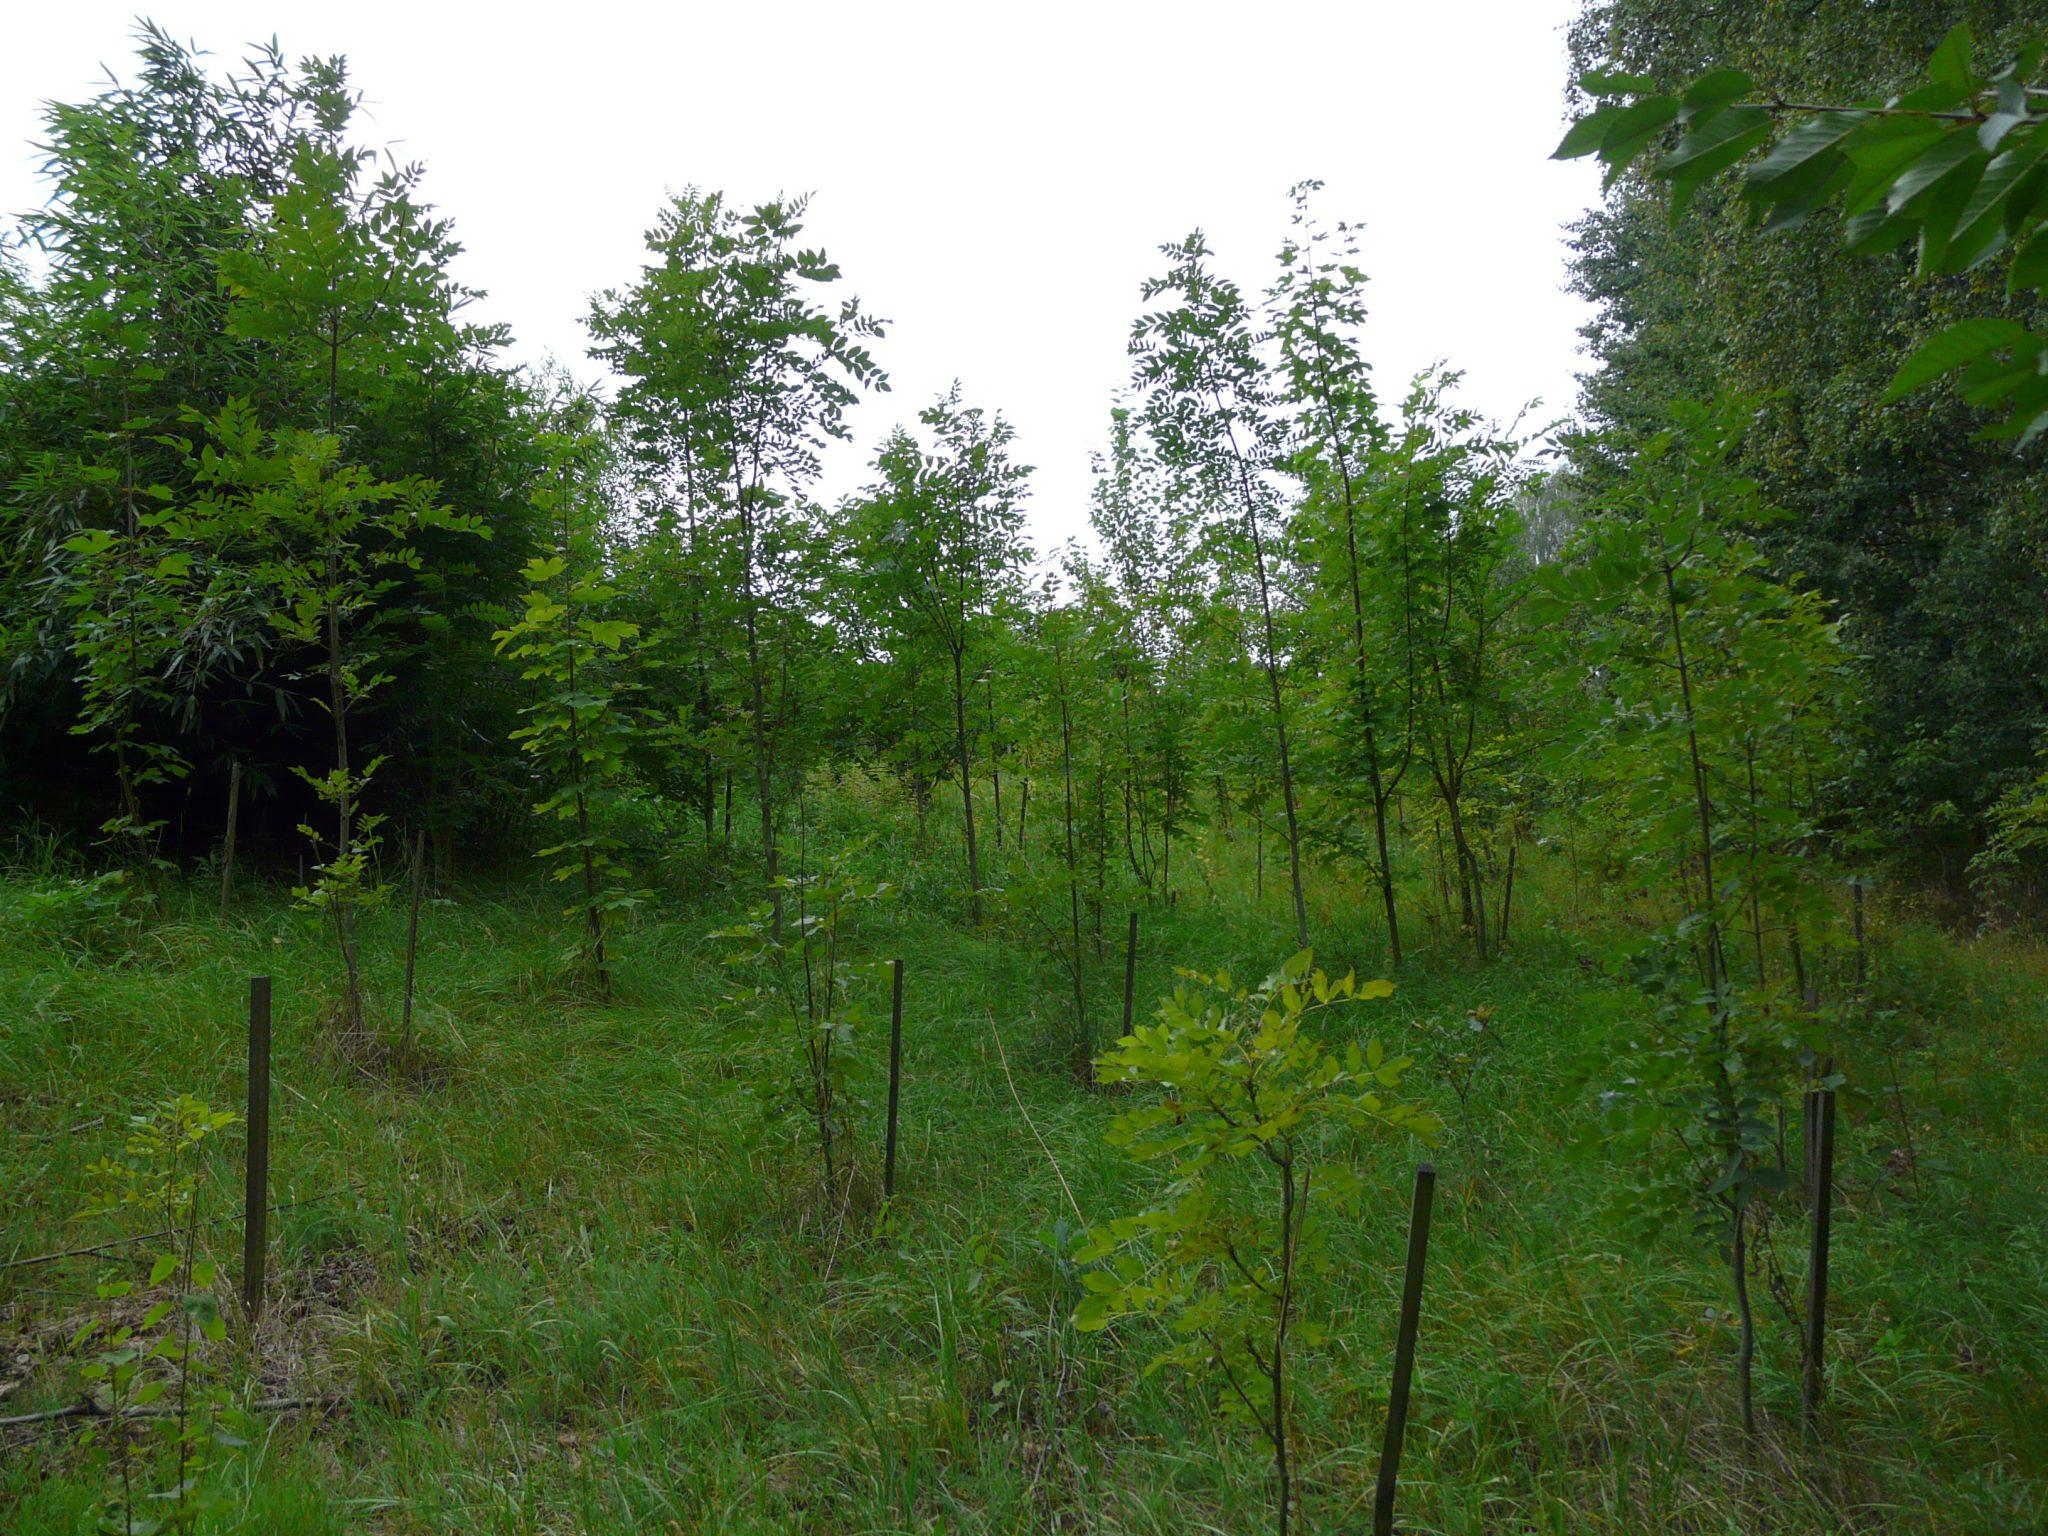 kopicovani, nizky les